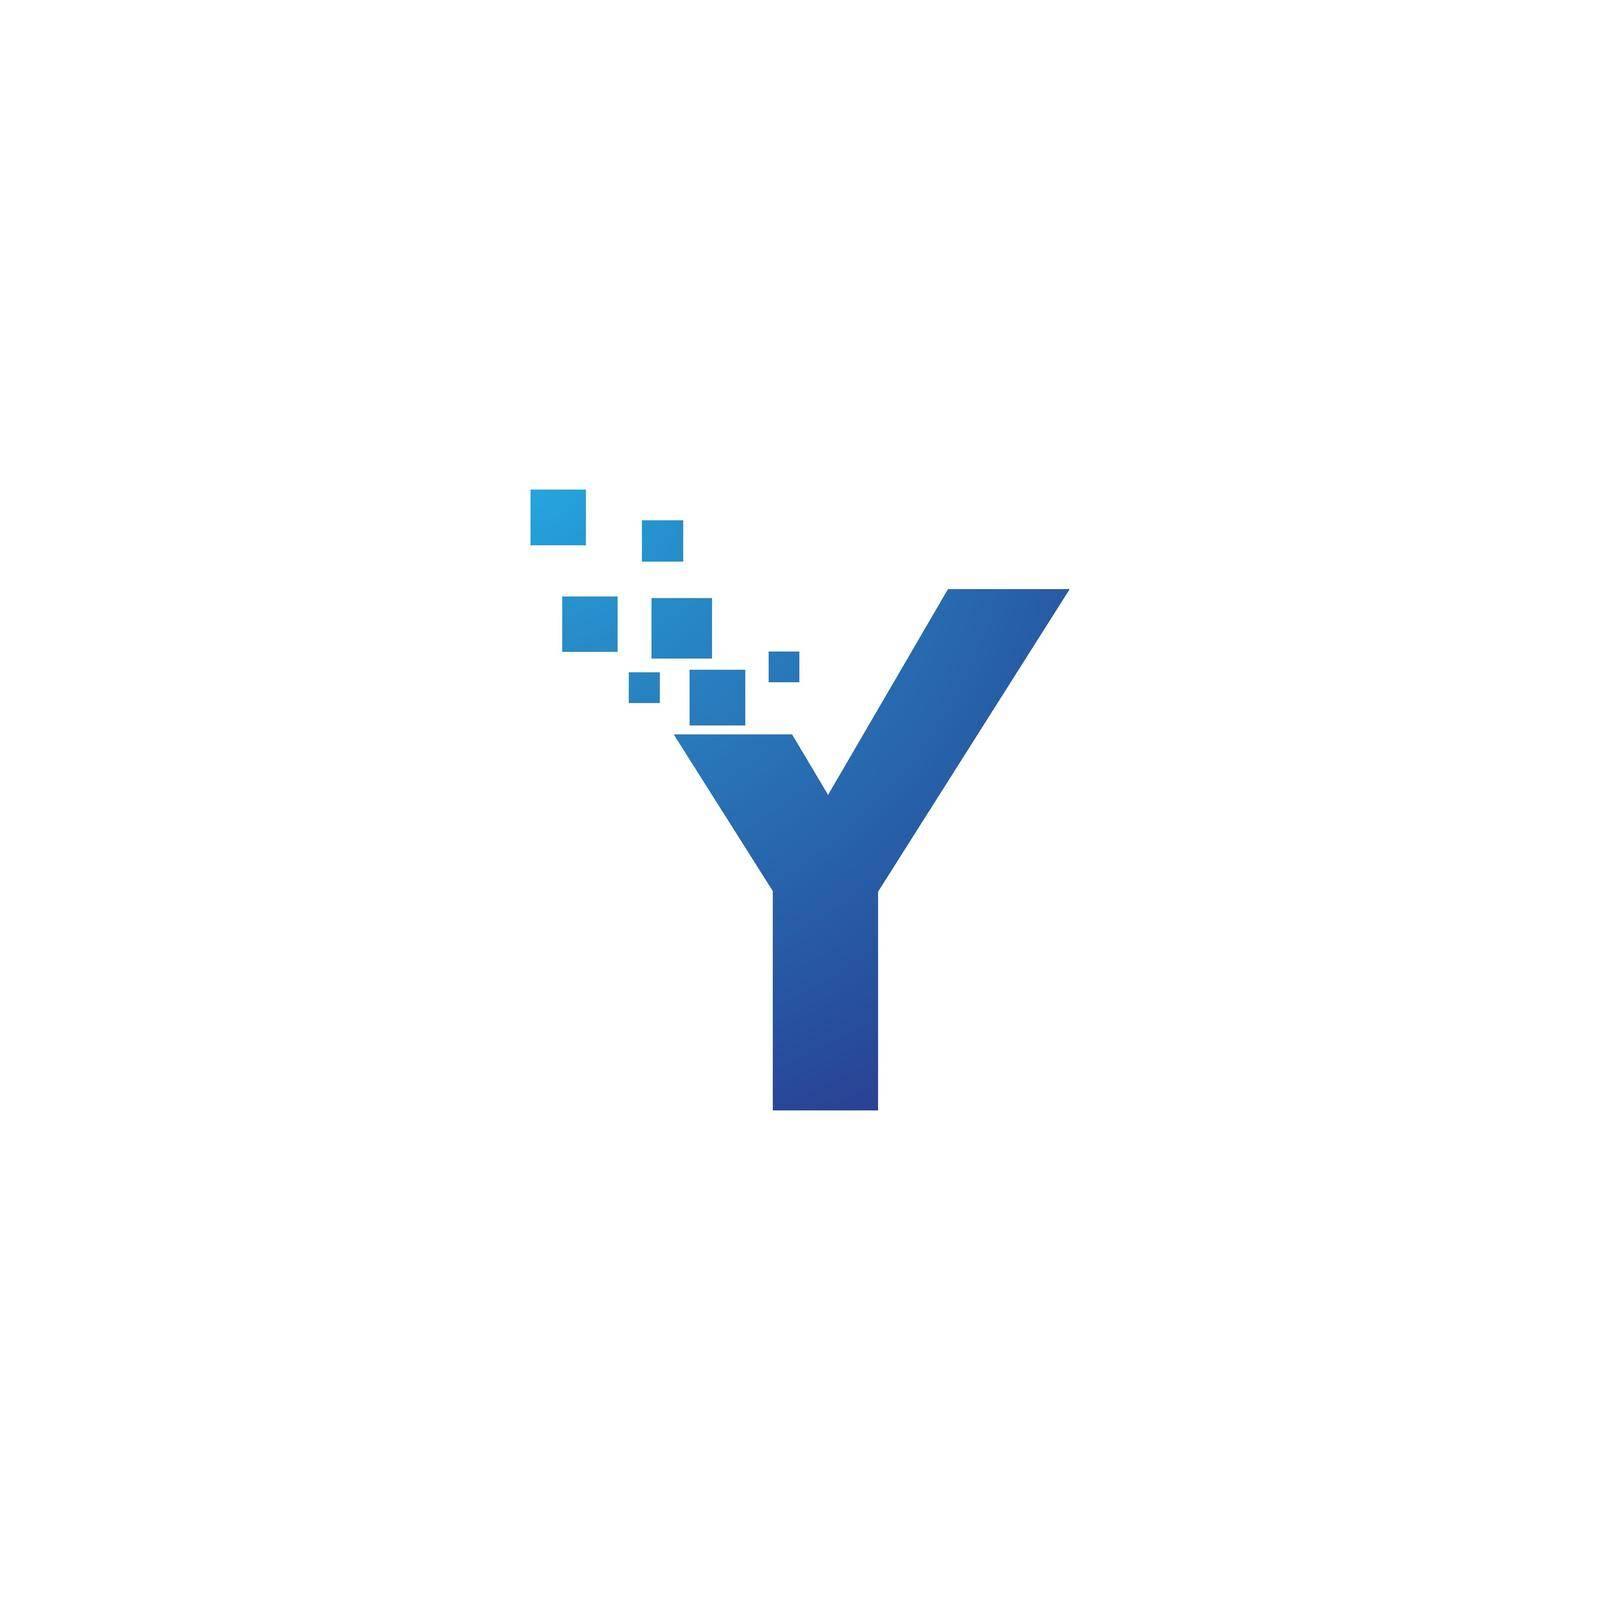 Initial letter alphabet pixel style logo vector design